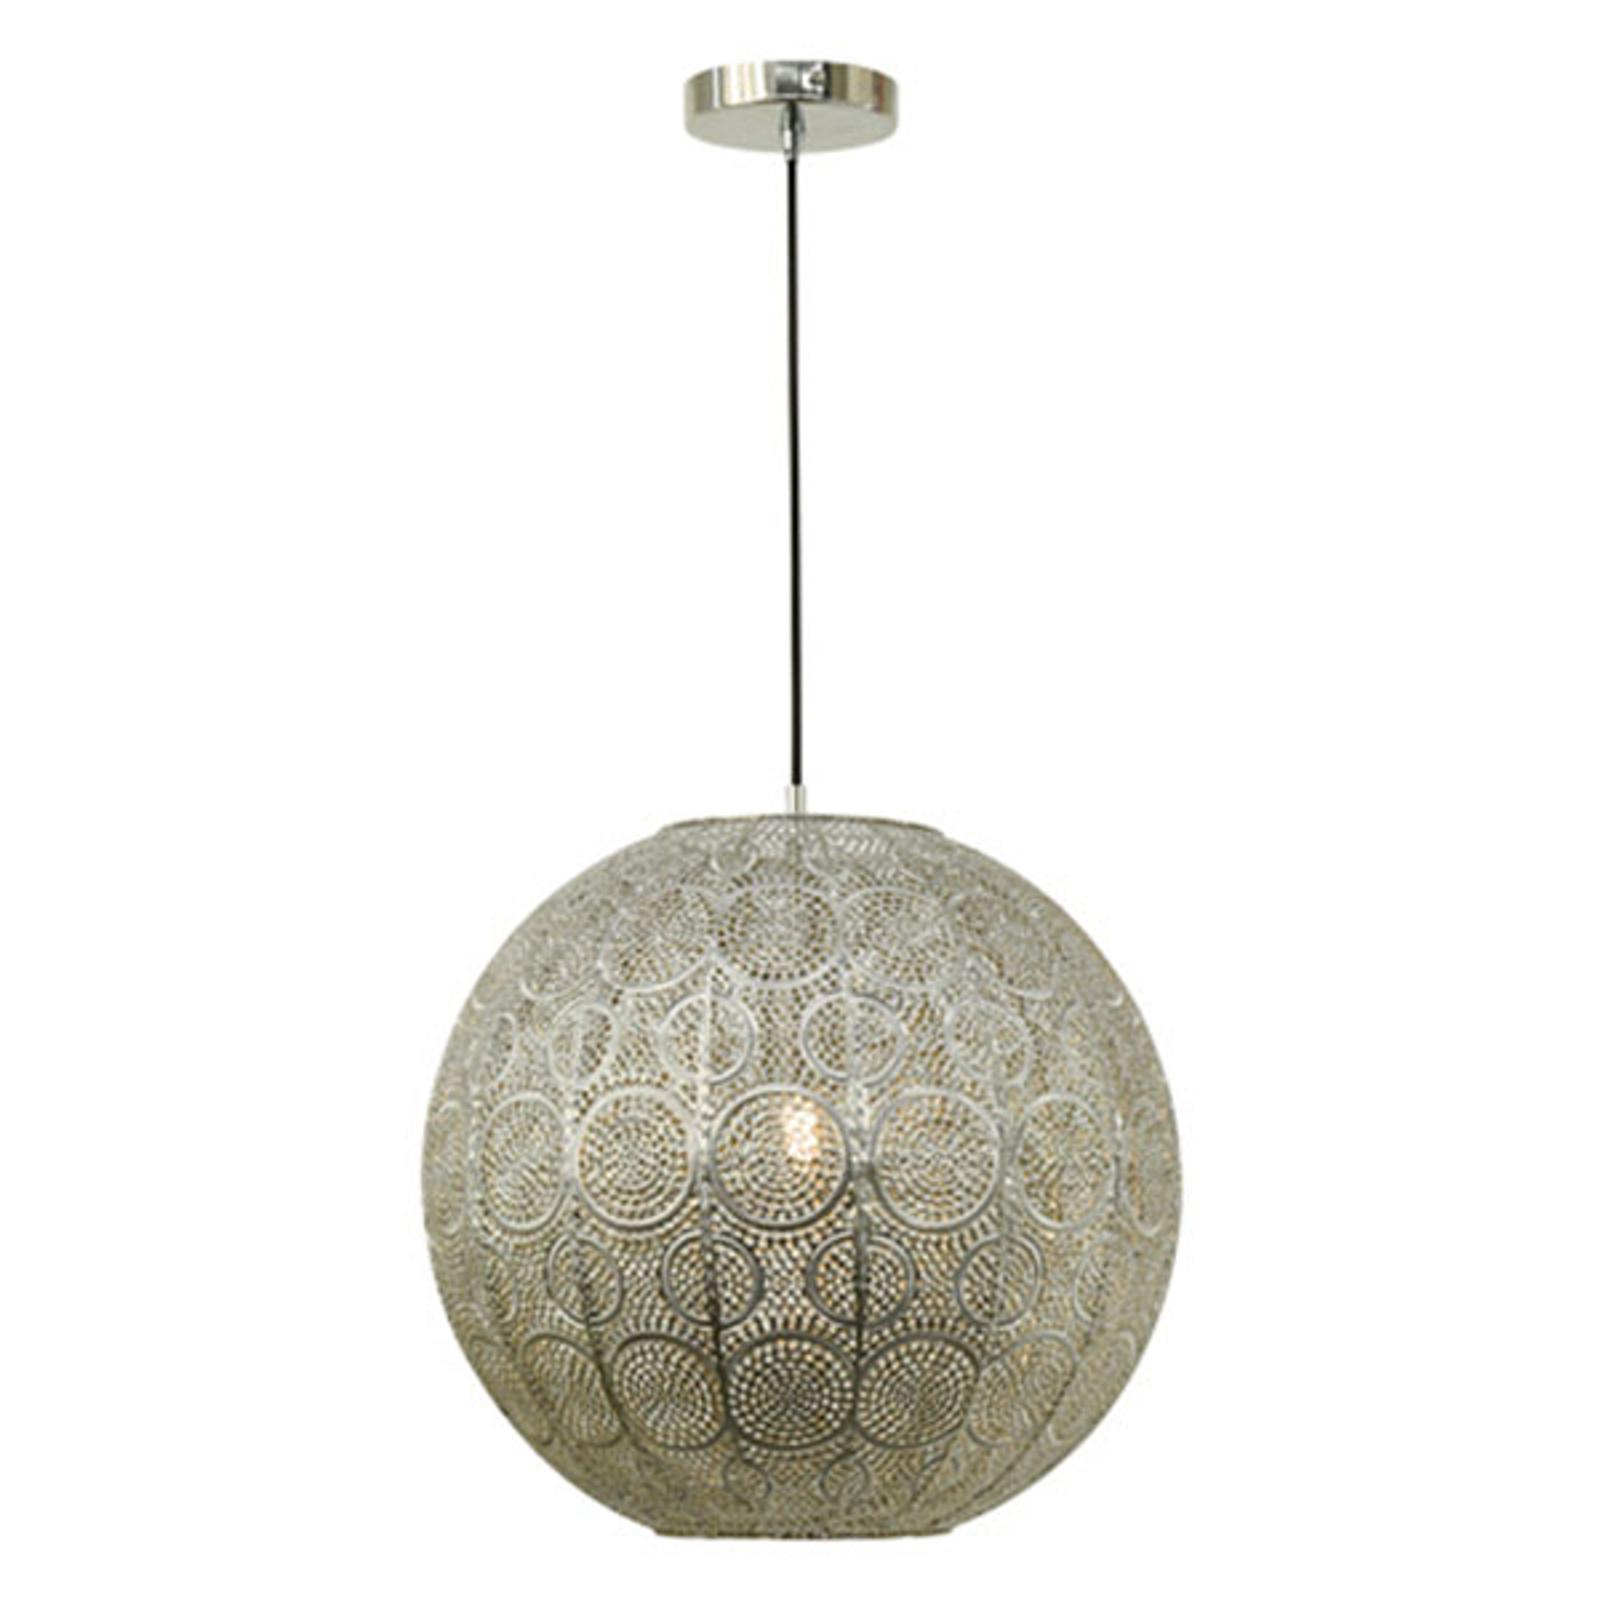 Lampa wisząca Stampa, kulista, Ø 40 cm